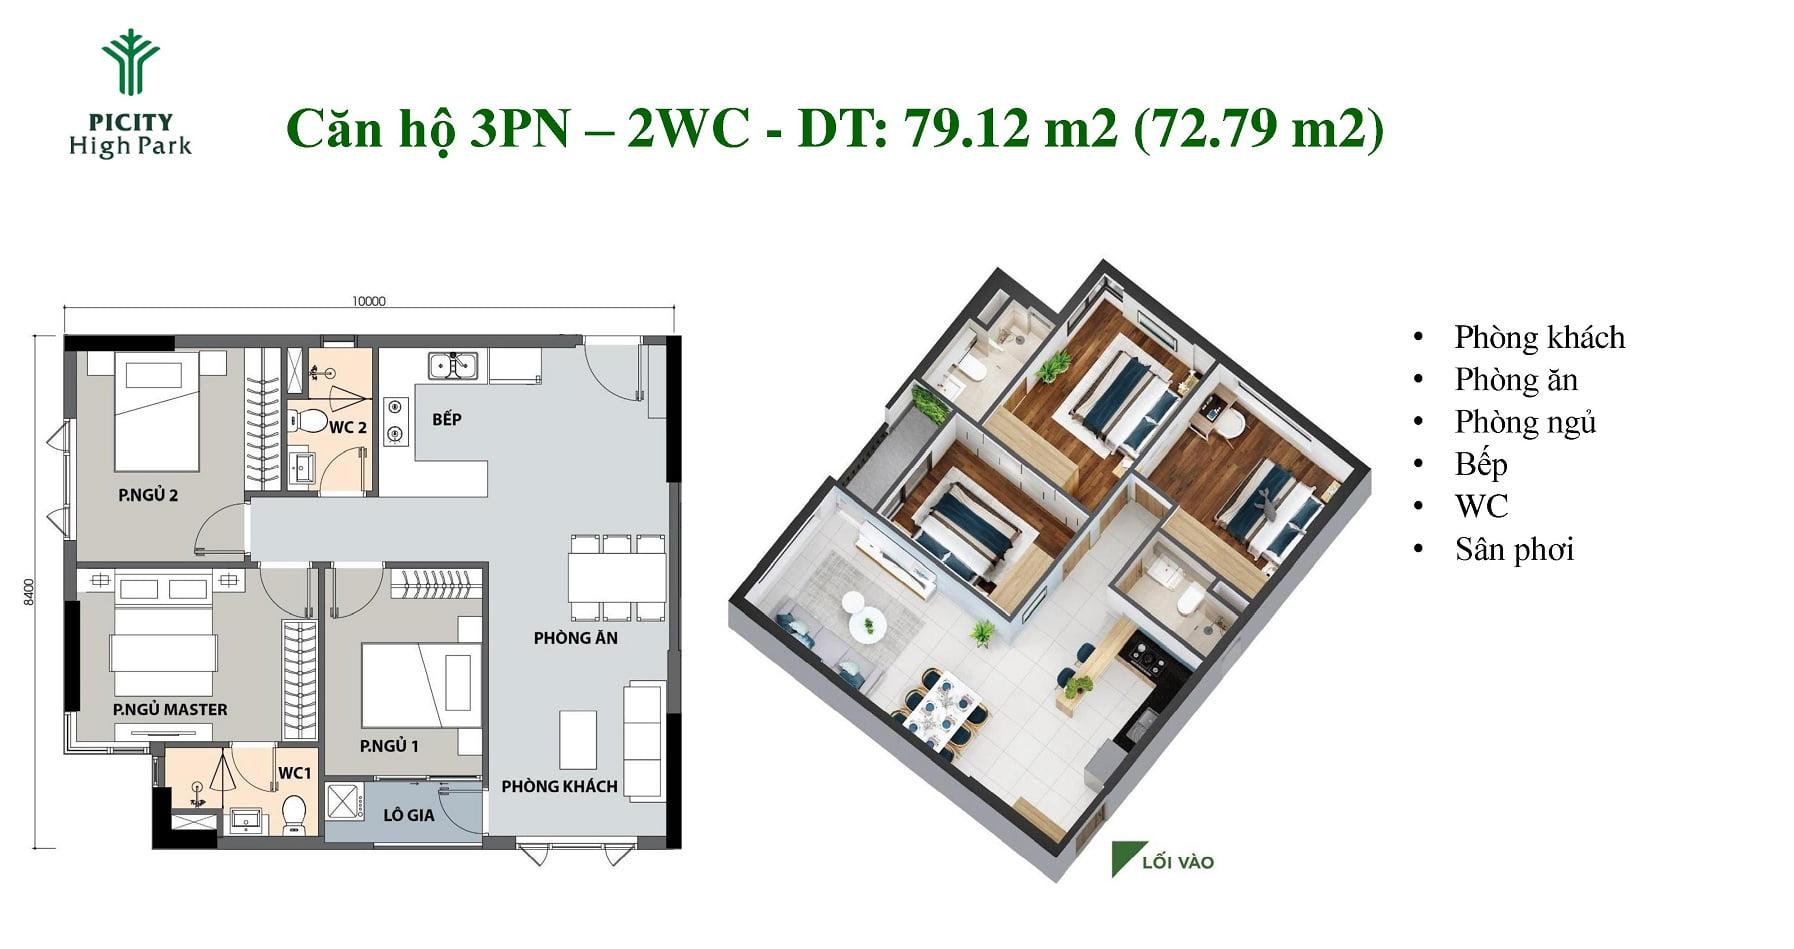 3pn2wc 79m2 picity